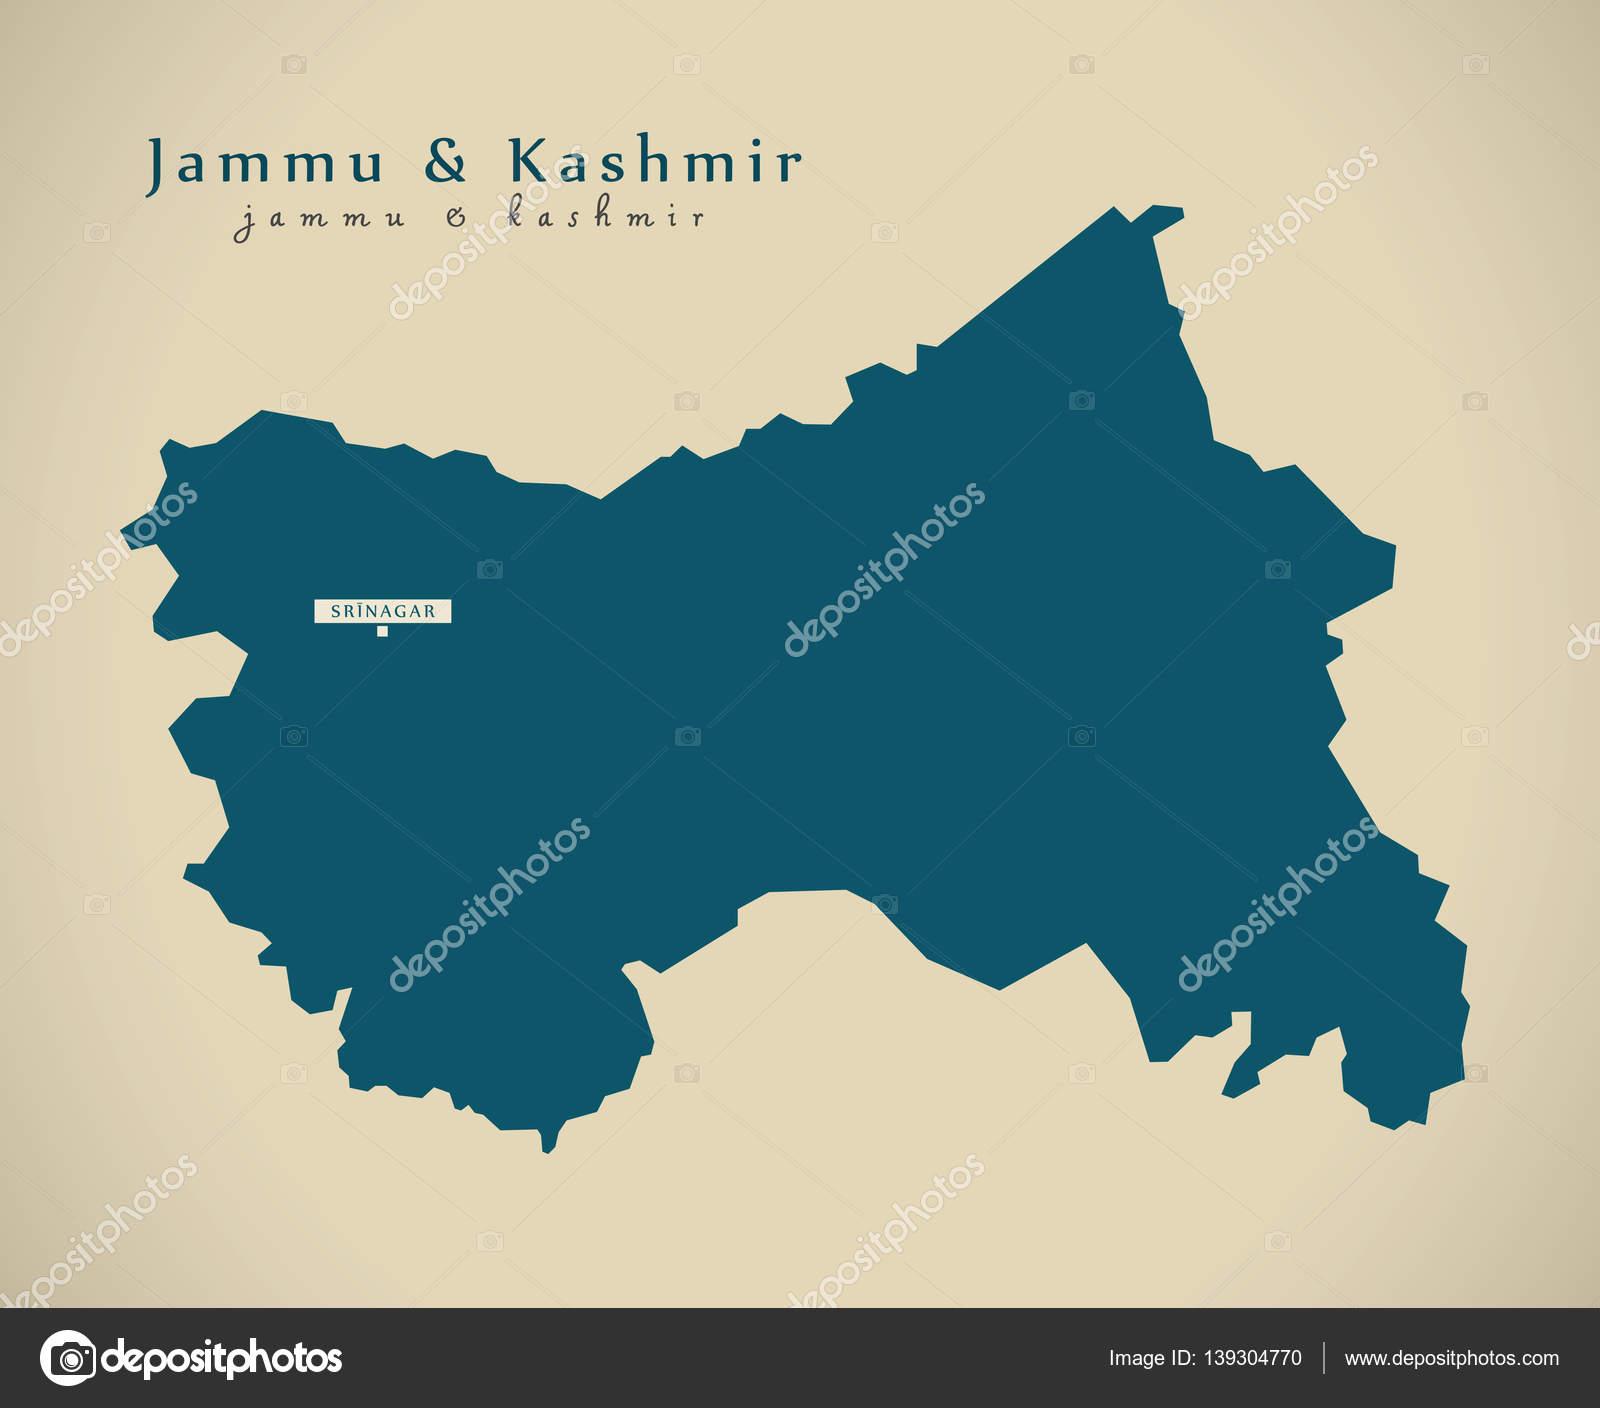 Modern Map - Jammu and Kashmir IN India federal state illustrati ...